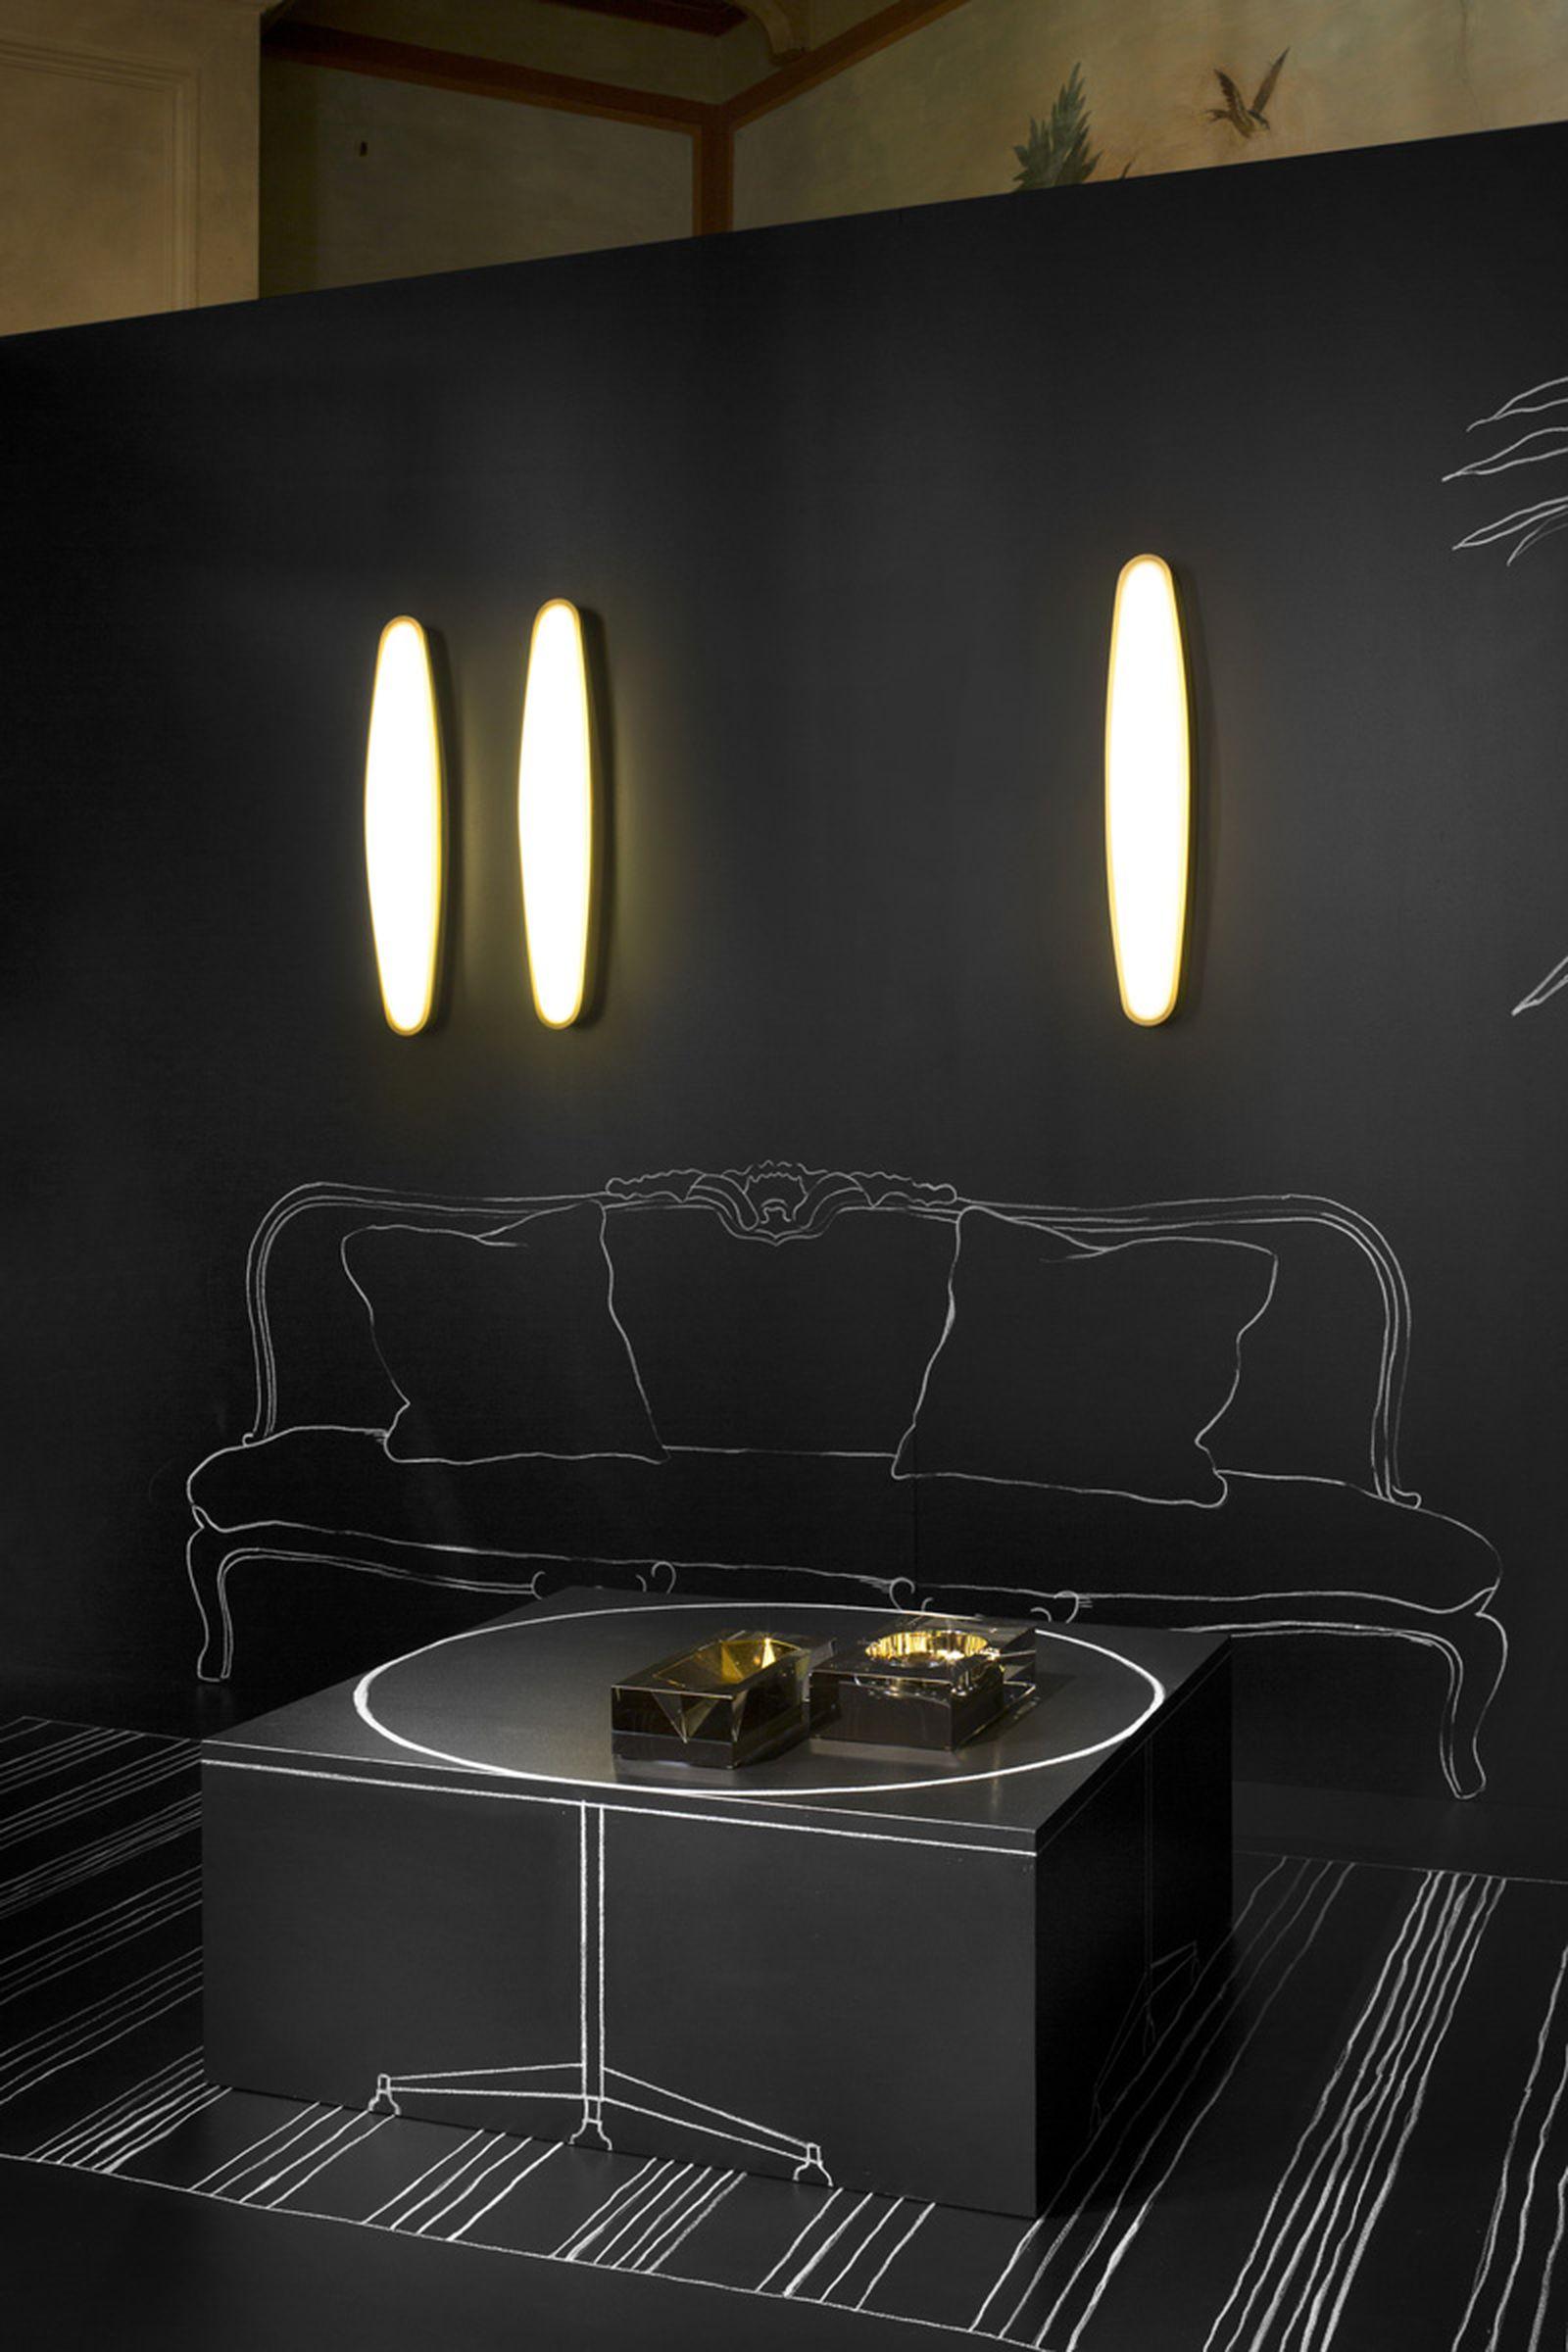 dior dimore 00=1' Milan Design Week 2019 salone del mobile